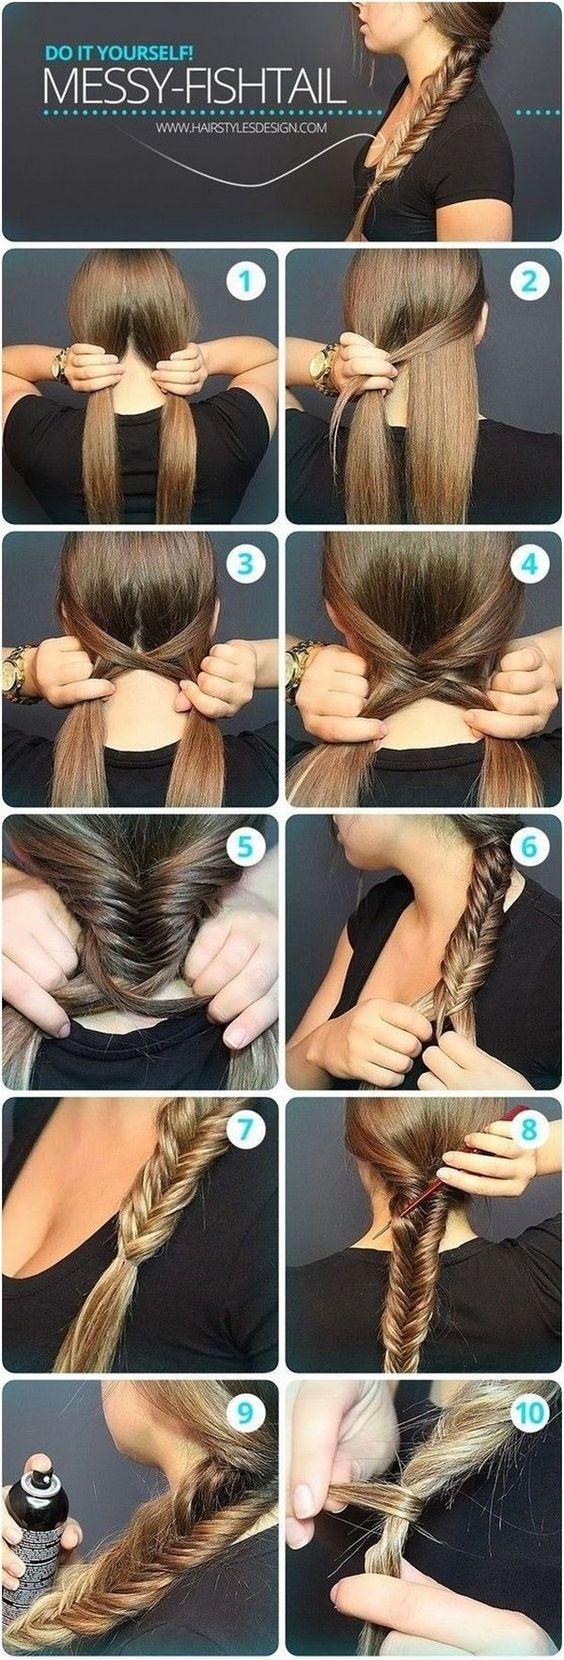 peinado con coleta muy facil